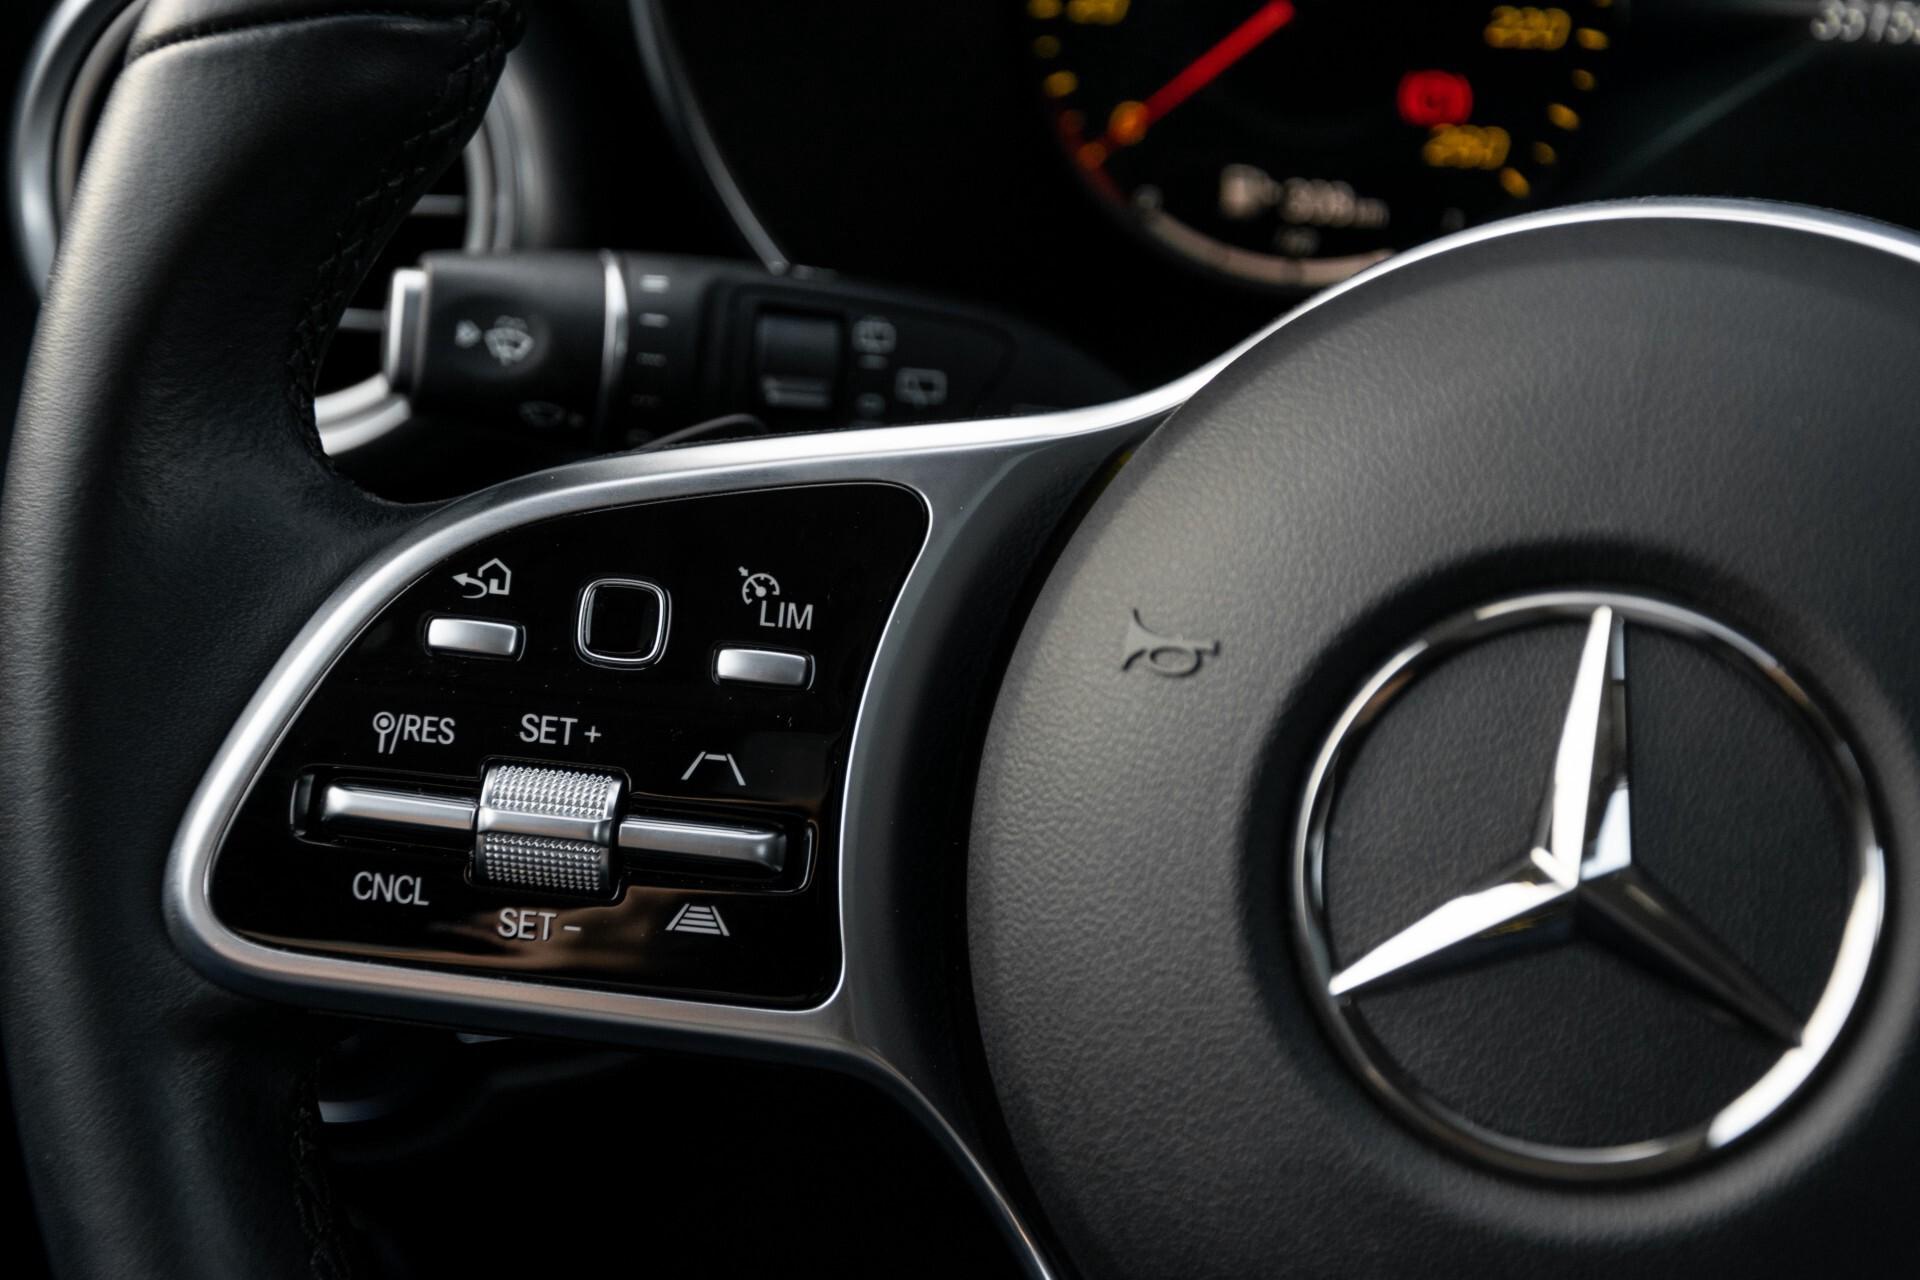 Mercedes-Benz GLC 300e 4-M Luchtvering/Panorama/Multicontourstoelen/Rij-assistentie/Standkachel Aut9 Foto 10